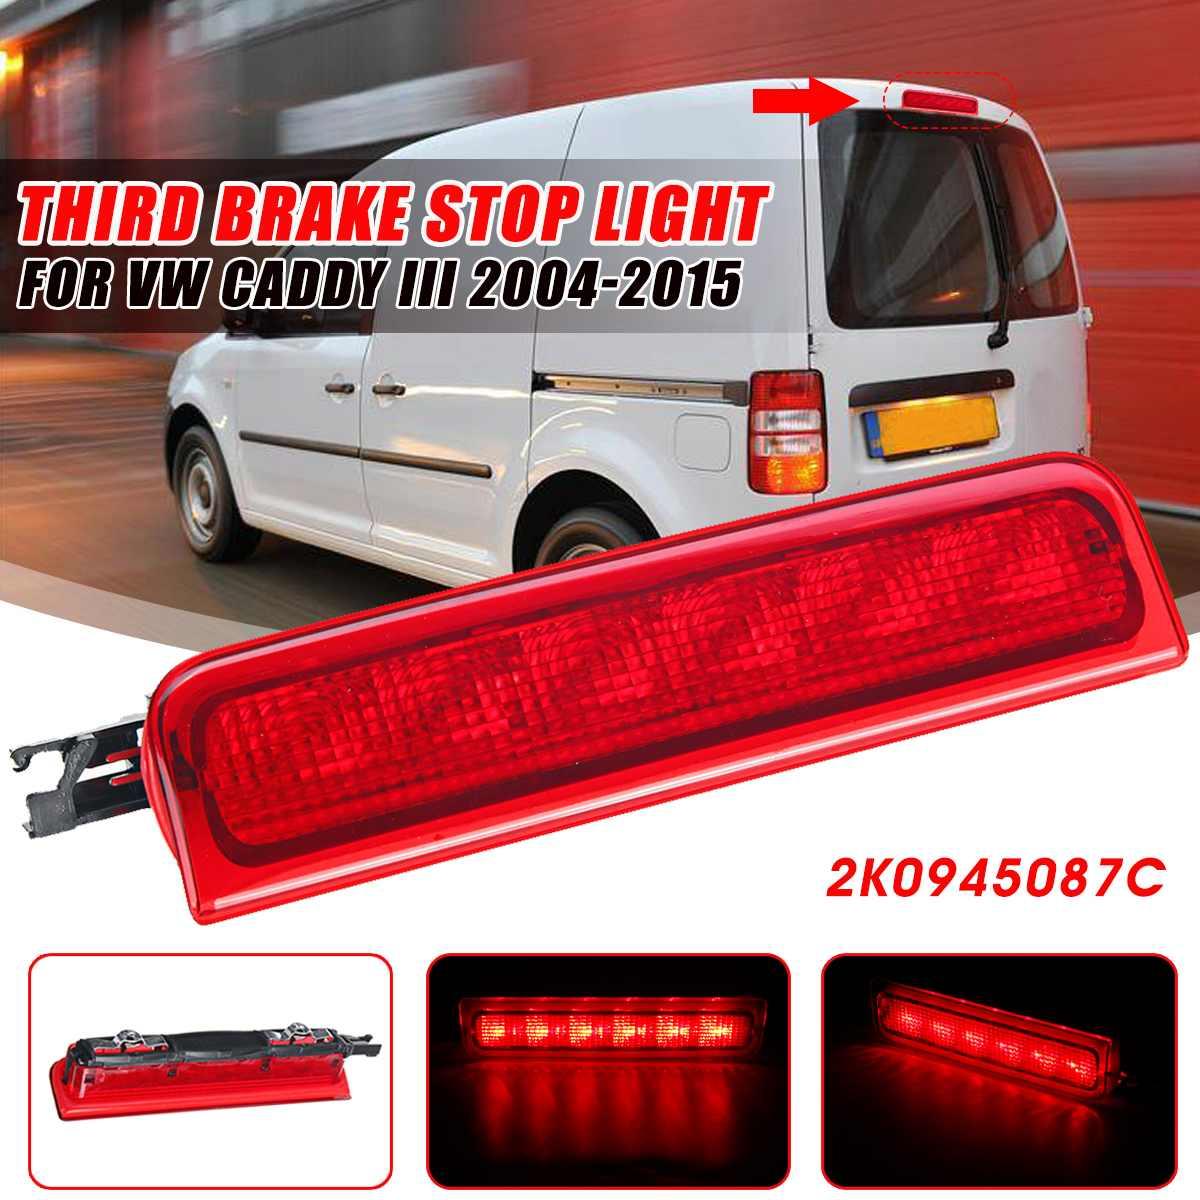 Luz de freno trasero de coche LED tercera lámpara de parada trasera 2K0945087C para VW Caddy III Box Estate 2001-2016